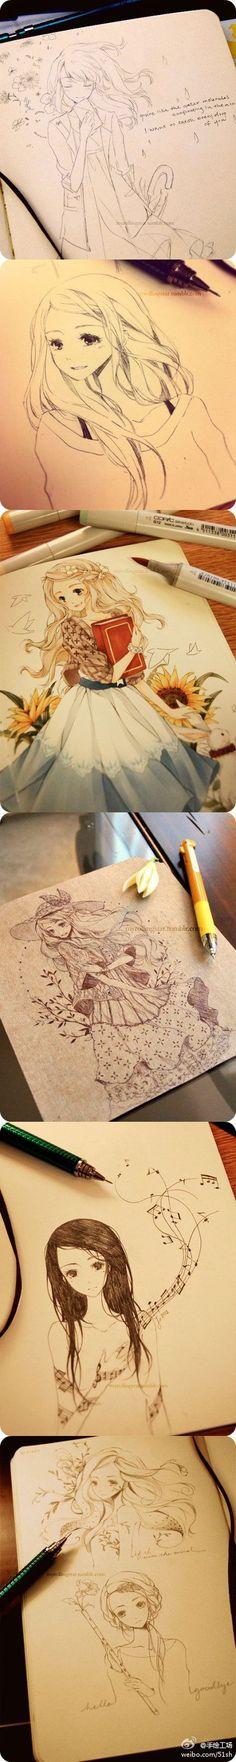 ✮ ANIME ART ✮ anime girls. . .drawing. . .doodle. . .work in progress. . .pen…